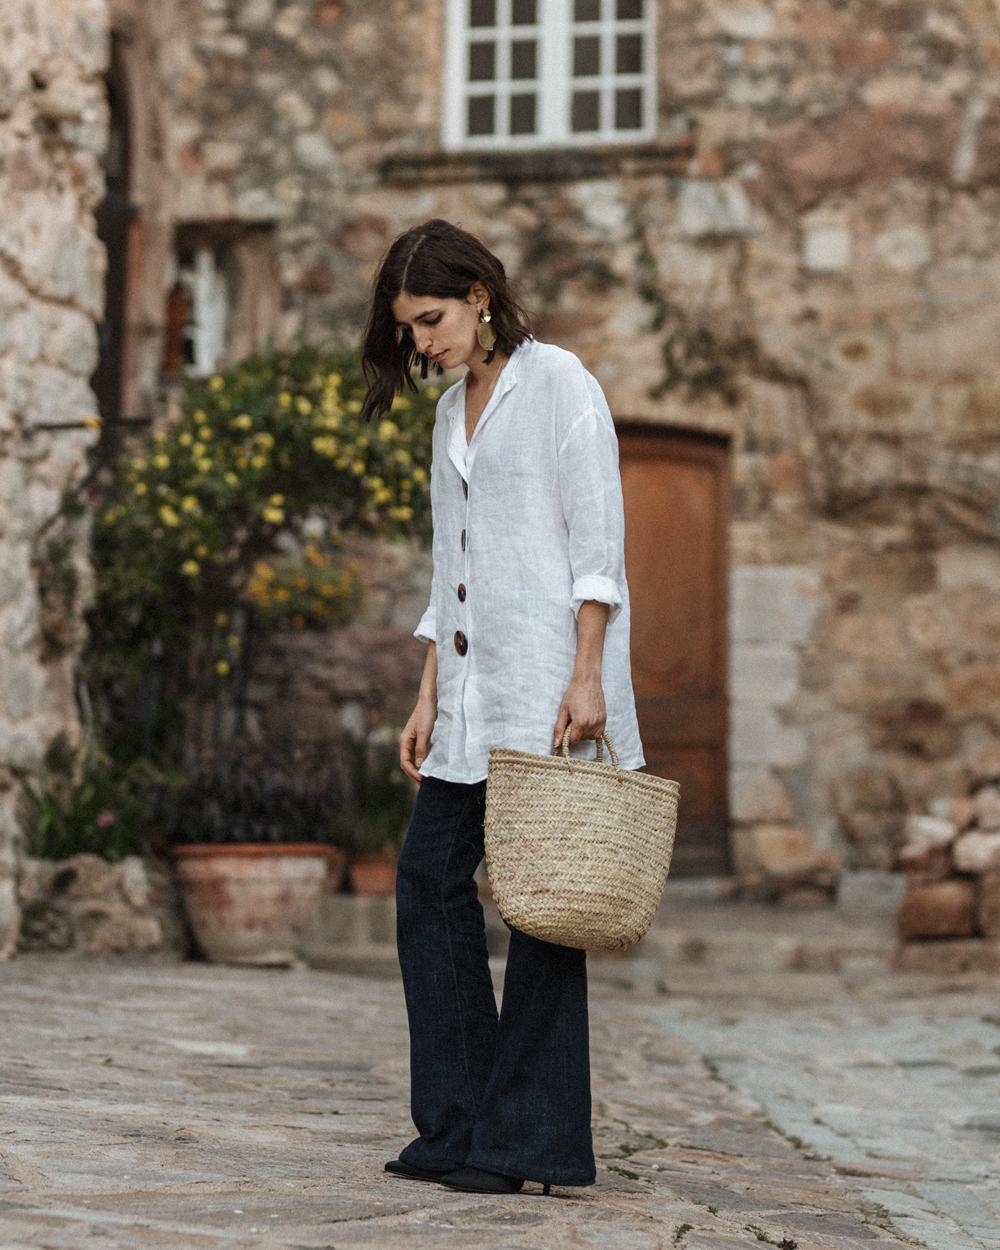 dd1fdfc039 oversized-linen-shirt-pair-flare-jeans-zara-mango-space-rocket-store-mules-aria-di-bari-french-street-style-fashion-blog-vintage-mediterranean-spring-summer  ...